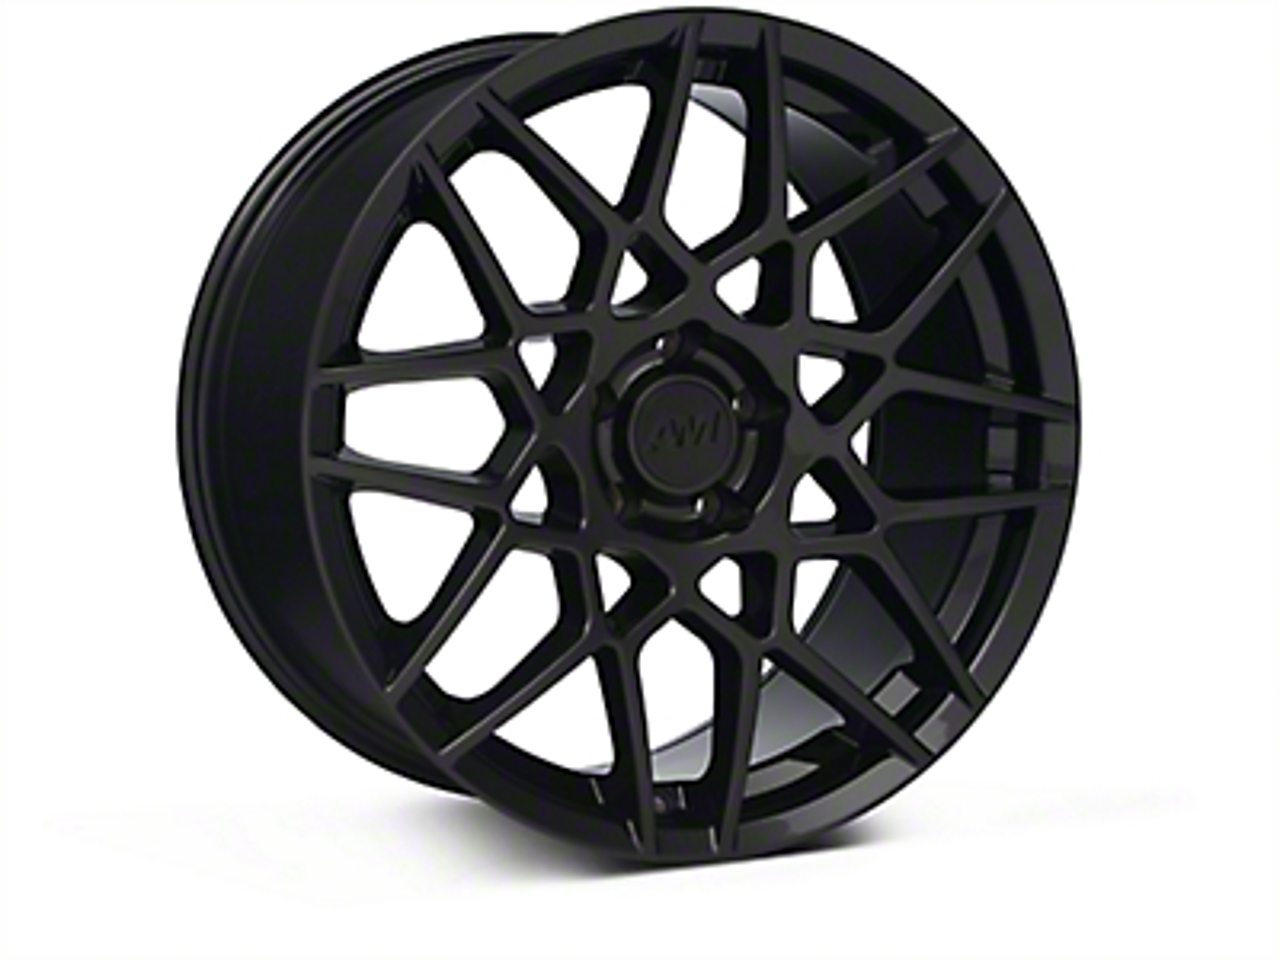 2013 GT500 Style Gloss Black Wheel - 19x9.5 (05-14 All)